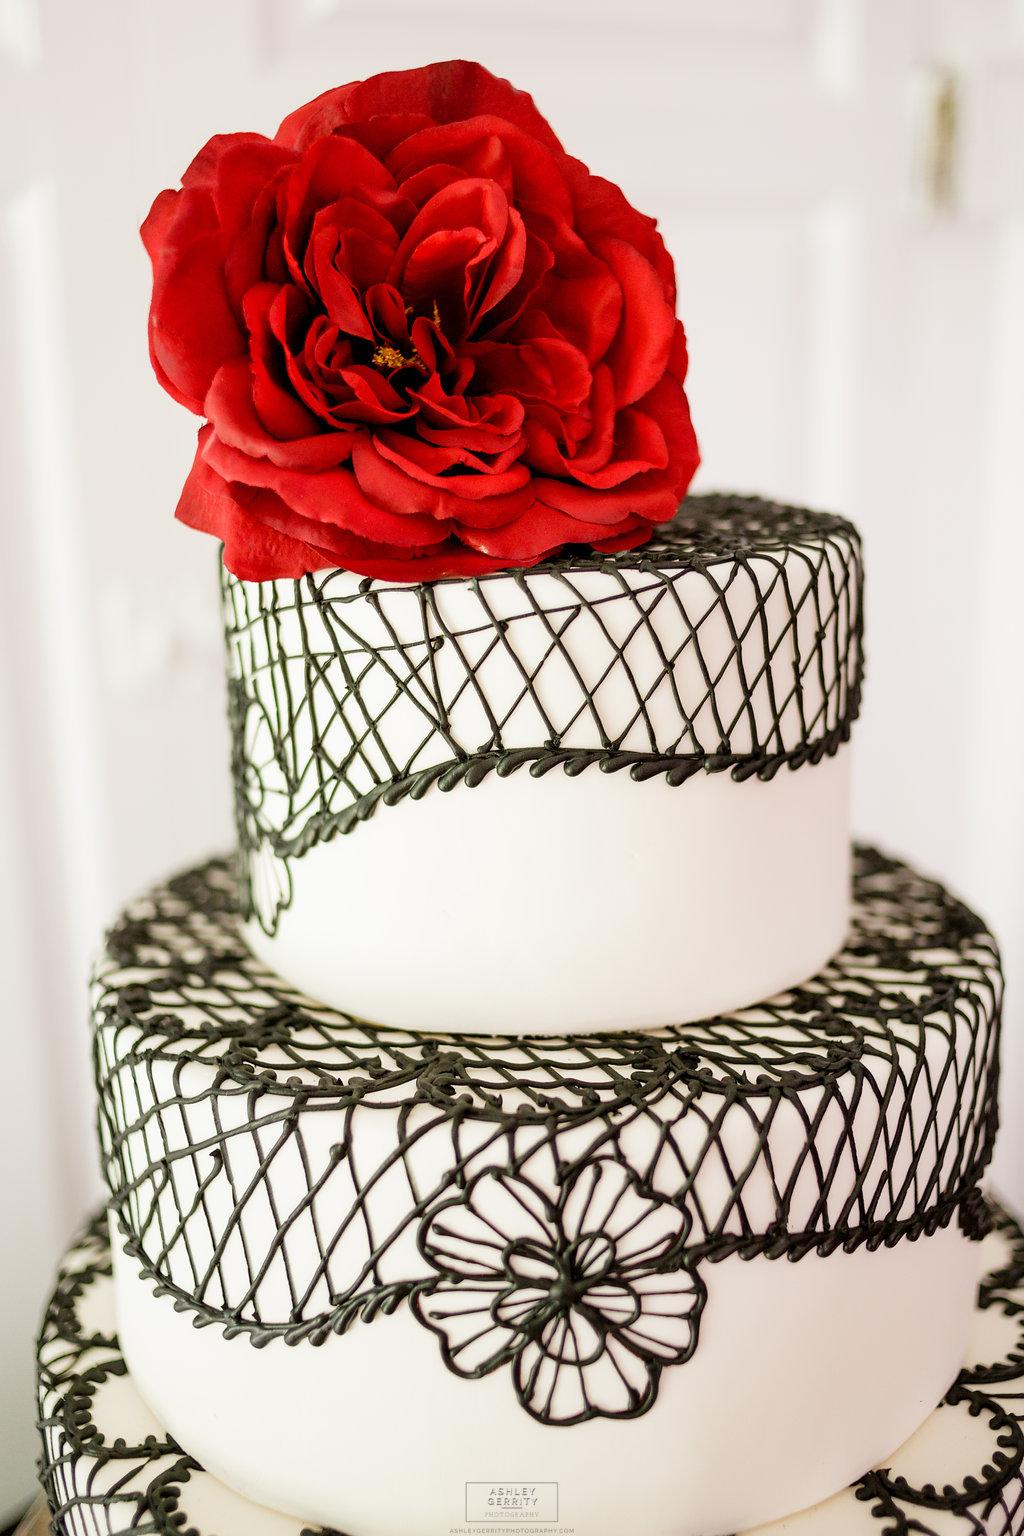 19 Spanish Rose Wedding Cake Brooklyn Girl Bakery Bolingbroke Mansion.jpg